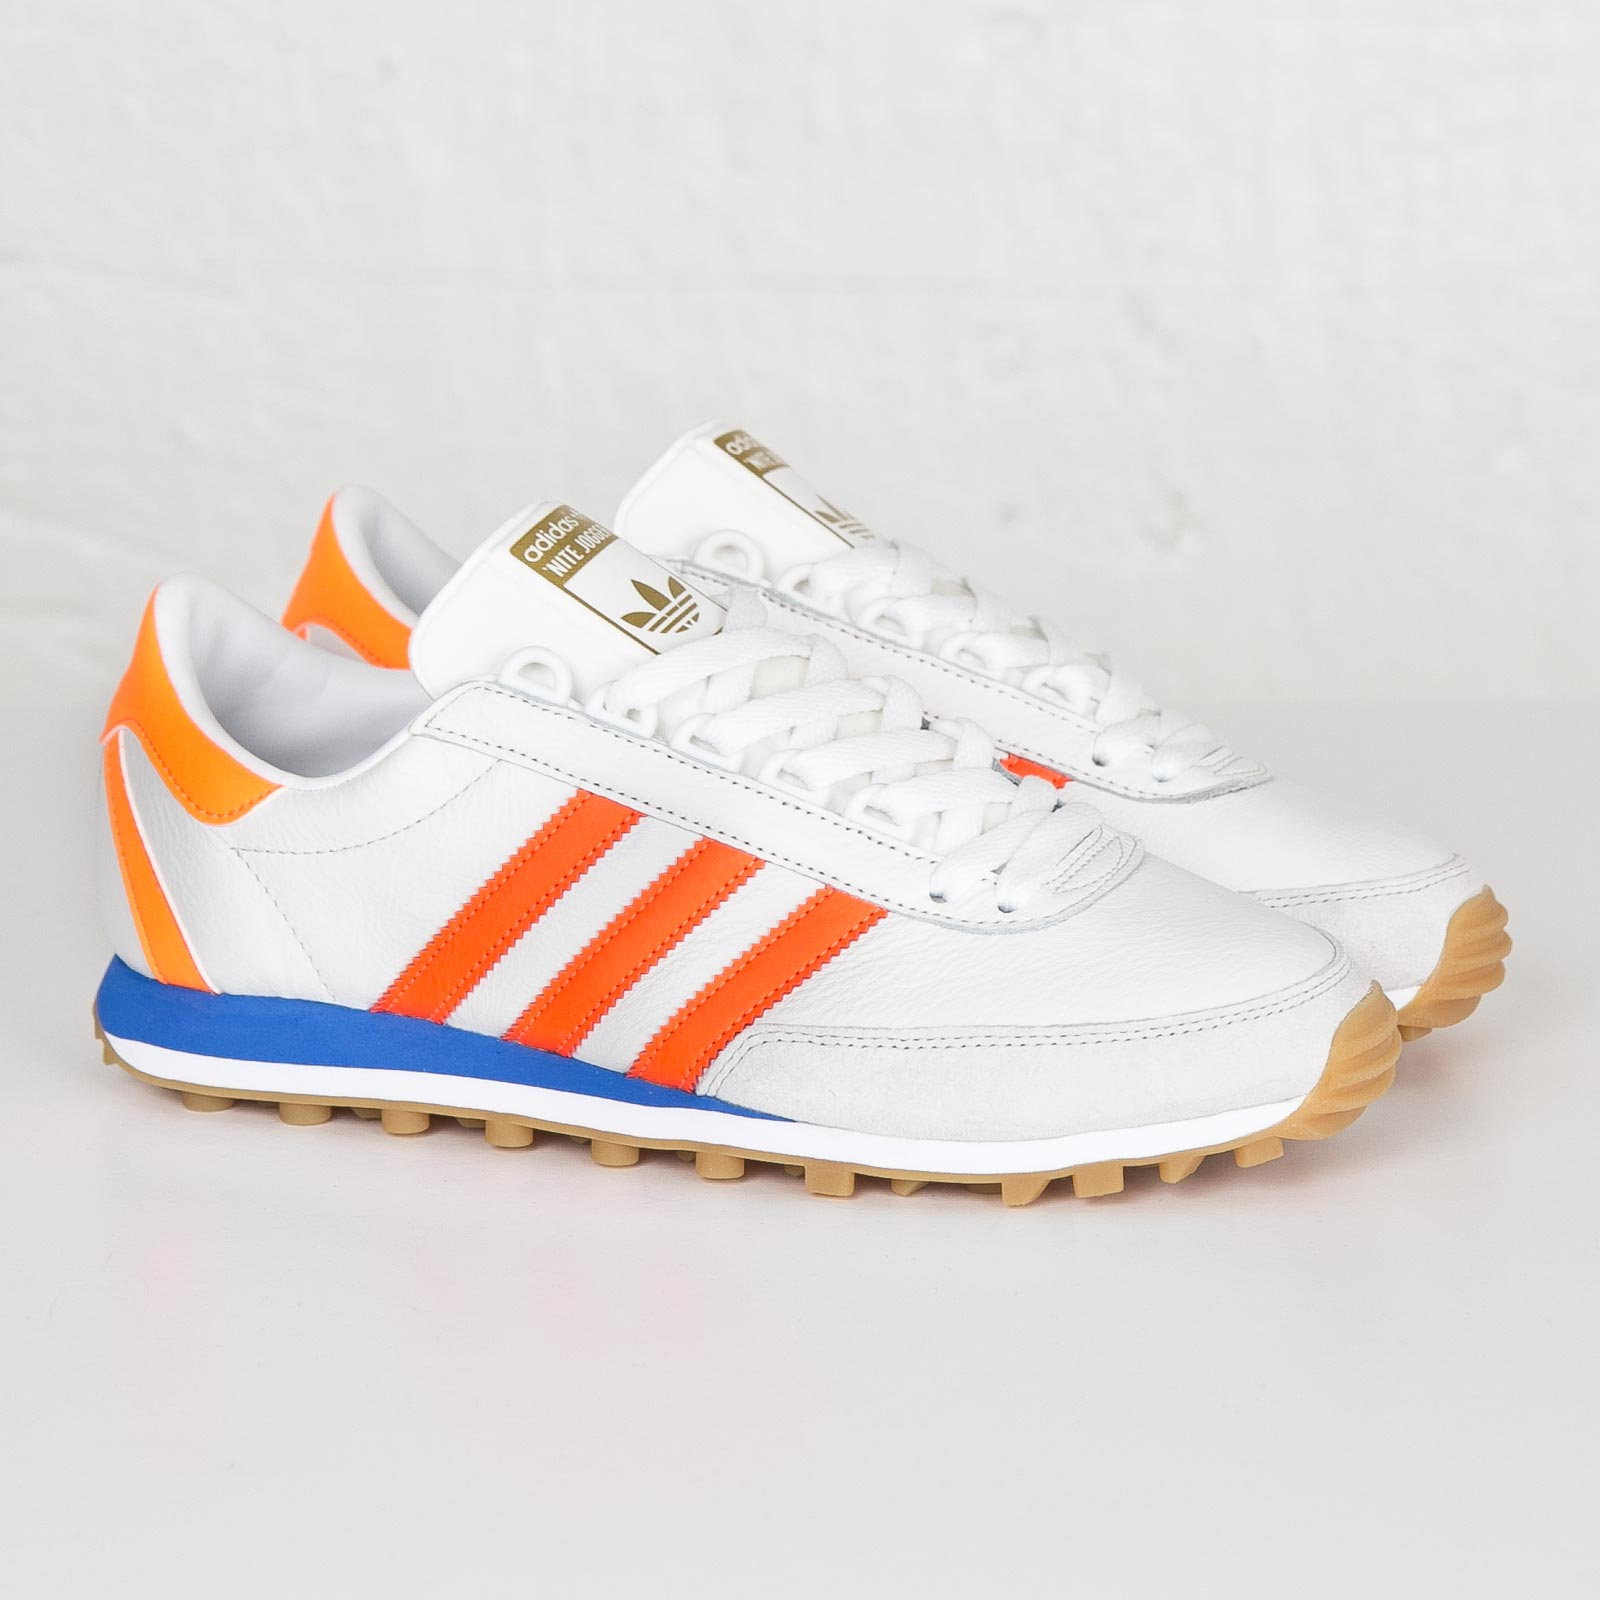 Sneakersnstuff Adidas amp; Sneakers B24790 Jogger Nite Streetwear tqrHtP